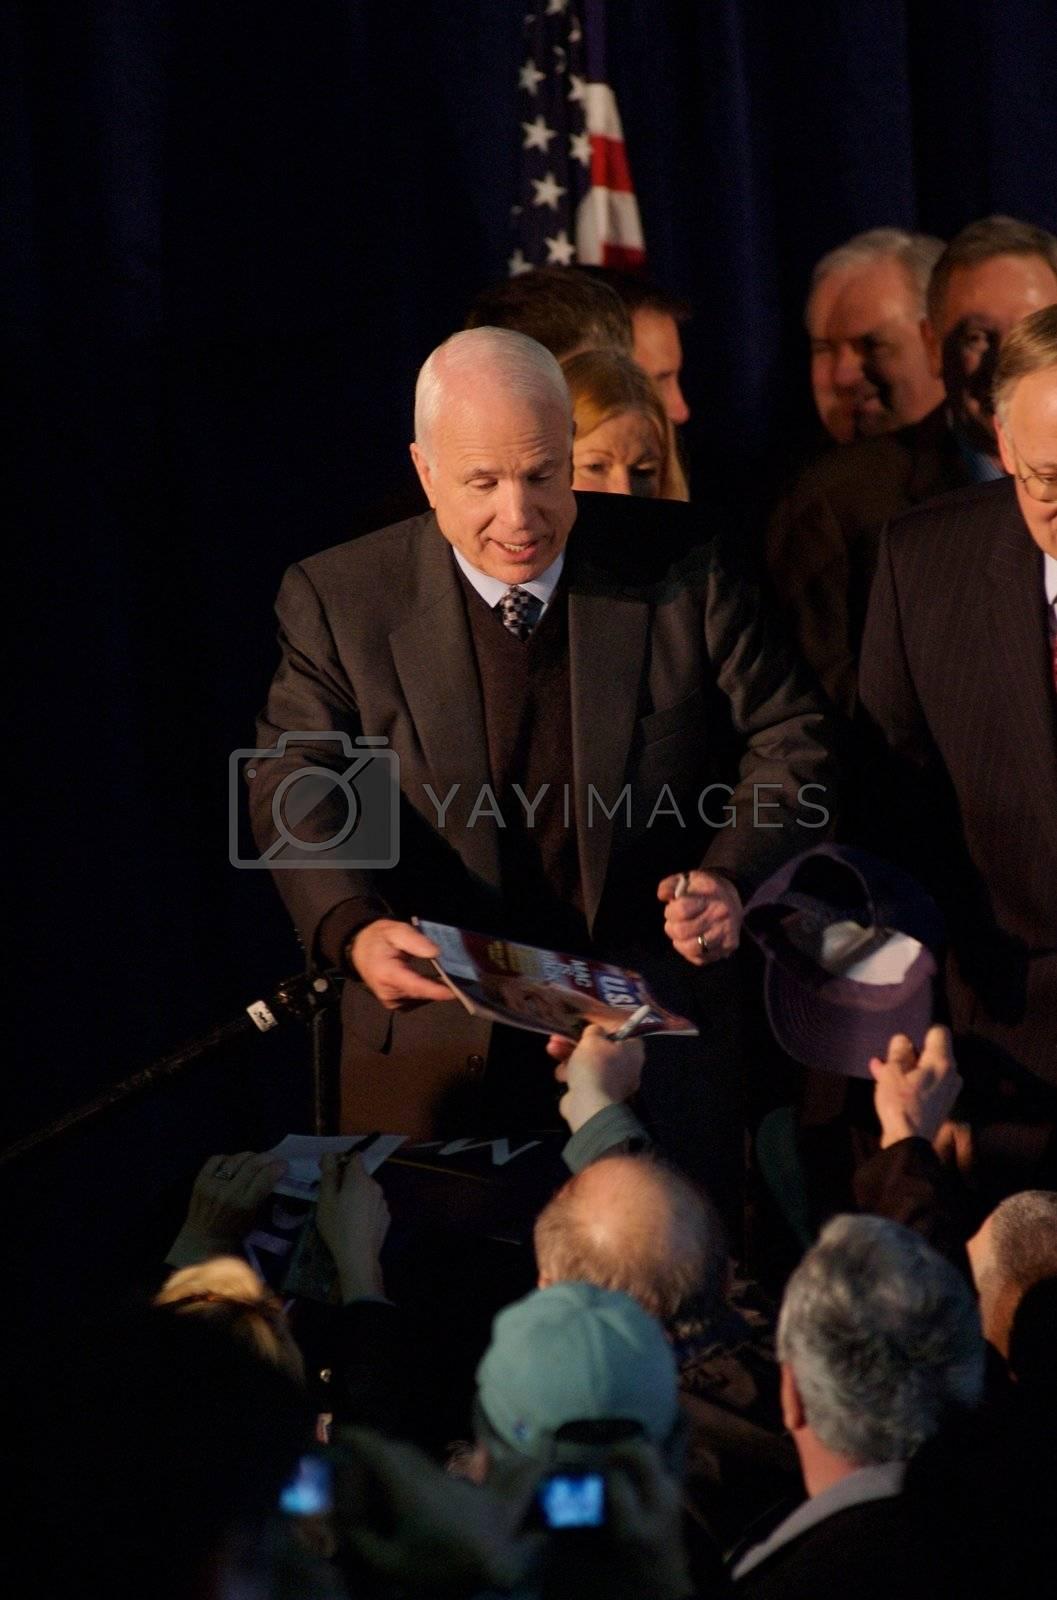 Senator John McCain, on his presidential campaign, gives a speech in South Burlington, VT